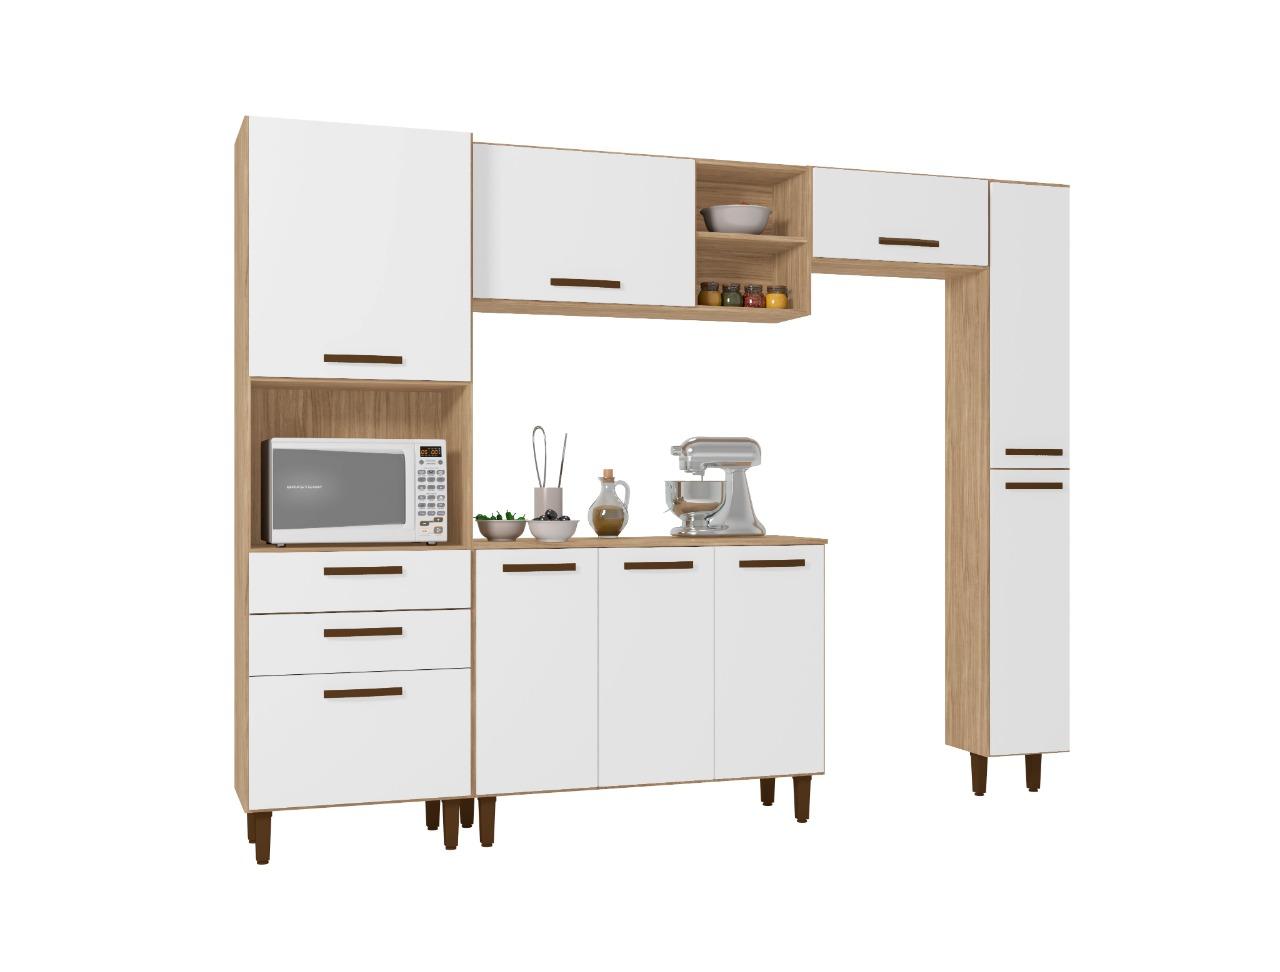 Cozinha Antonella Incorplac Cor Cartagema Branco